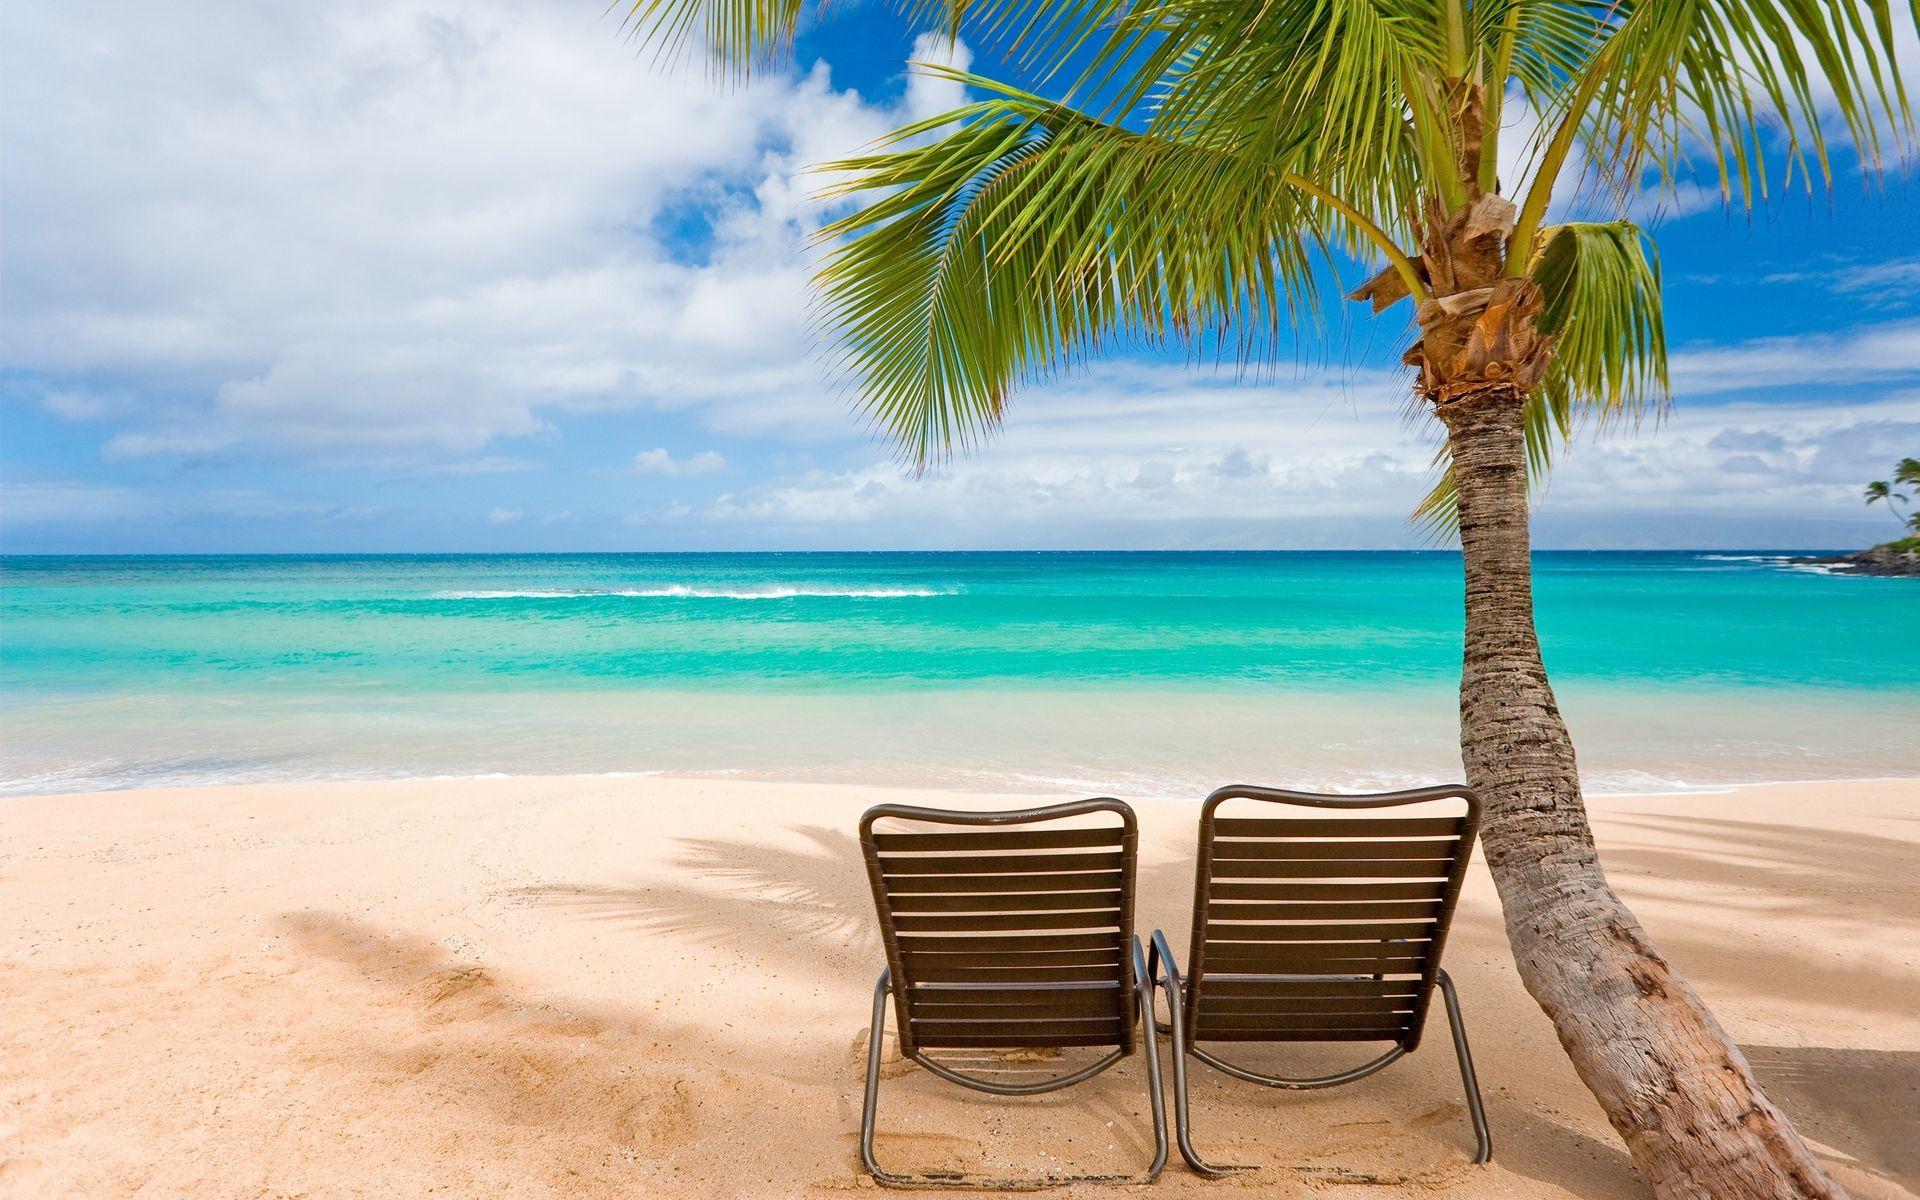 Oahu beach chair rental hawaii beach time - 12 Must Visit Beaches Of Hawaii Trip Designers